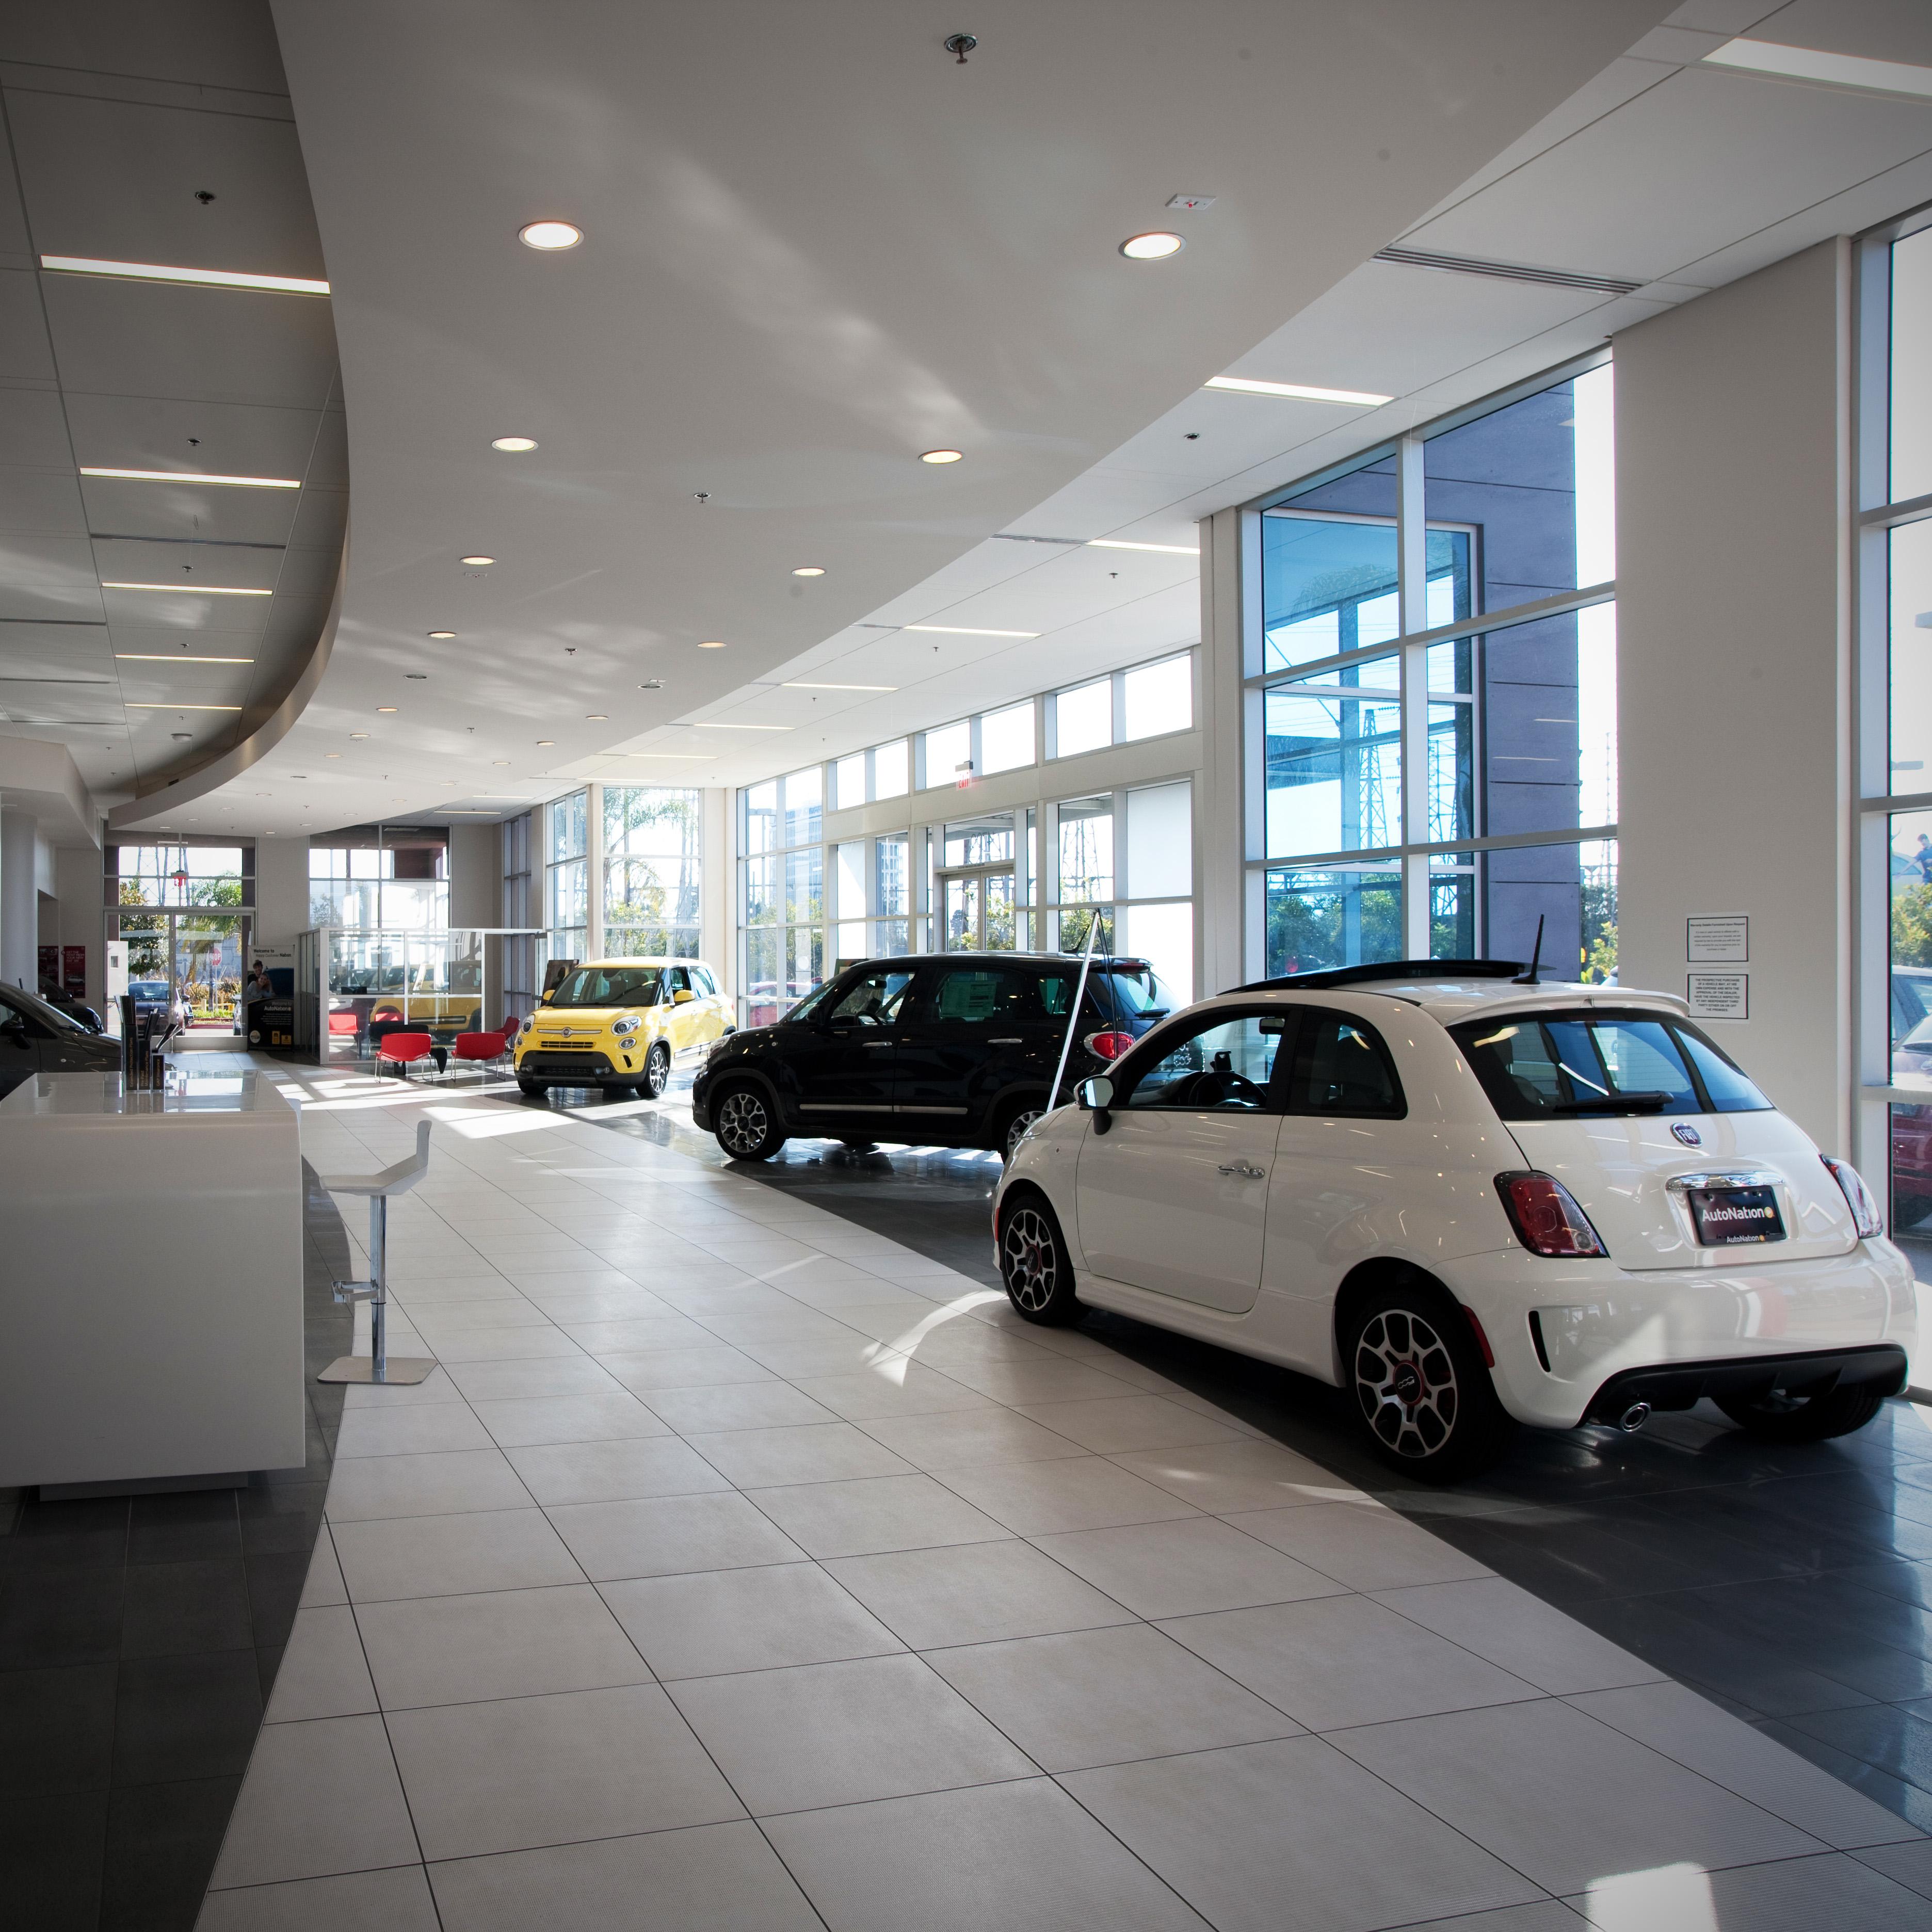 Autonation Fiat Hawthorne >> AutoNation FIAT South Bay - Closed in Hawthorne, CA 90250 - ChamberofCommerce.com